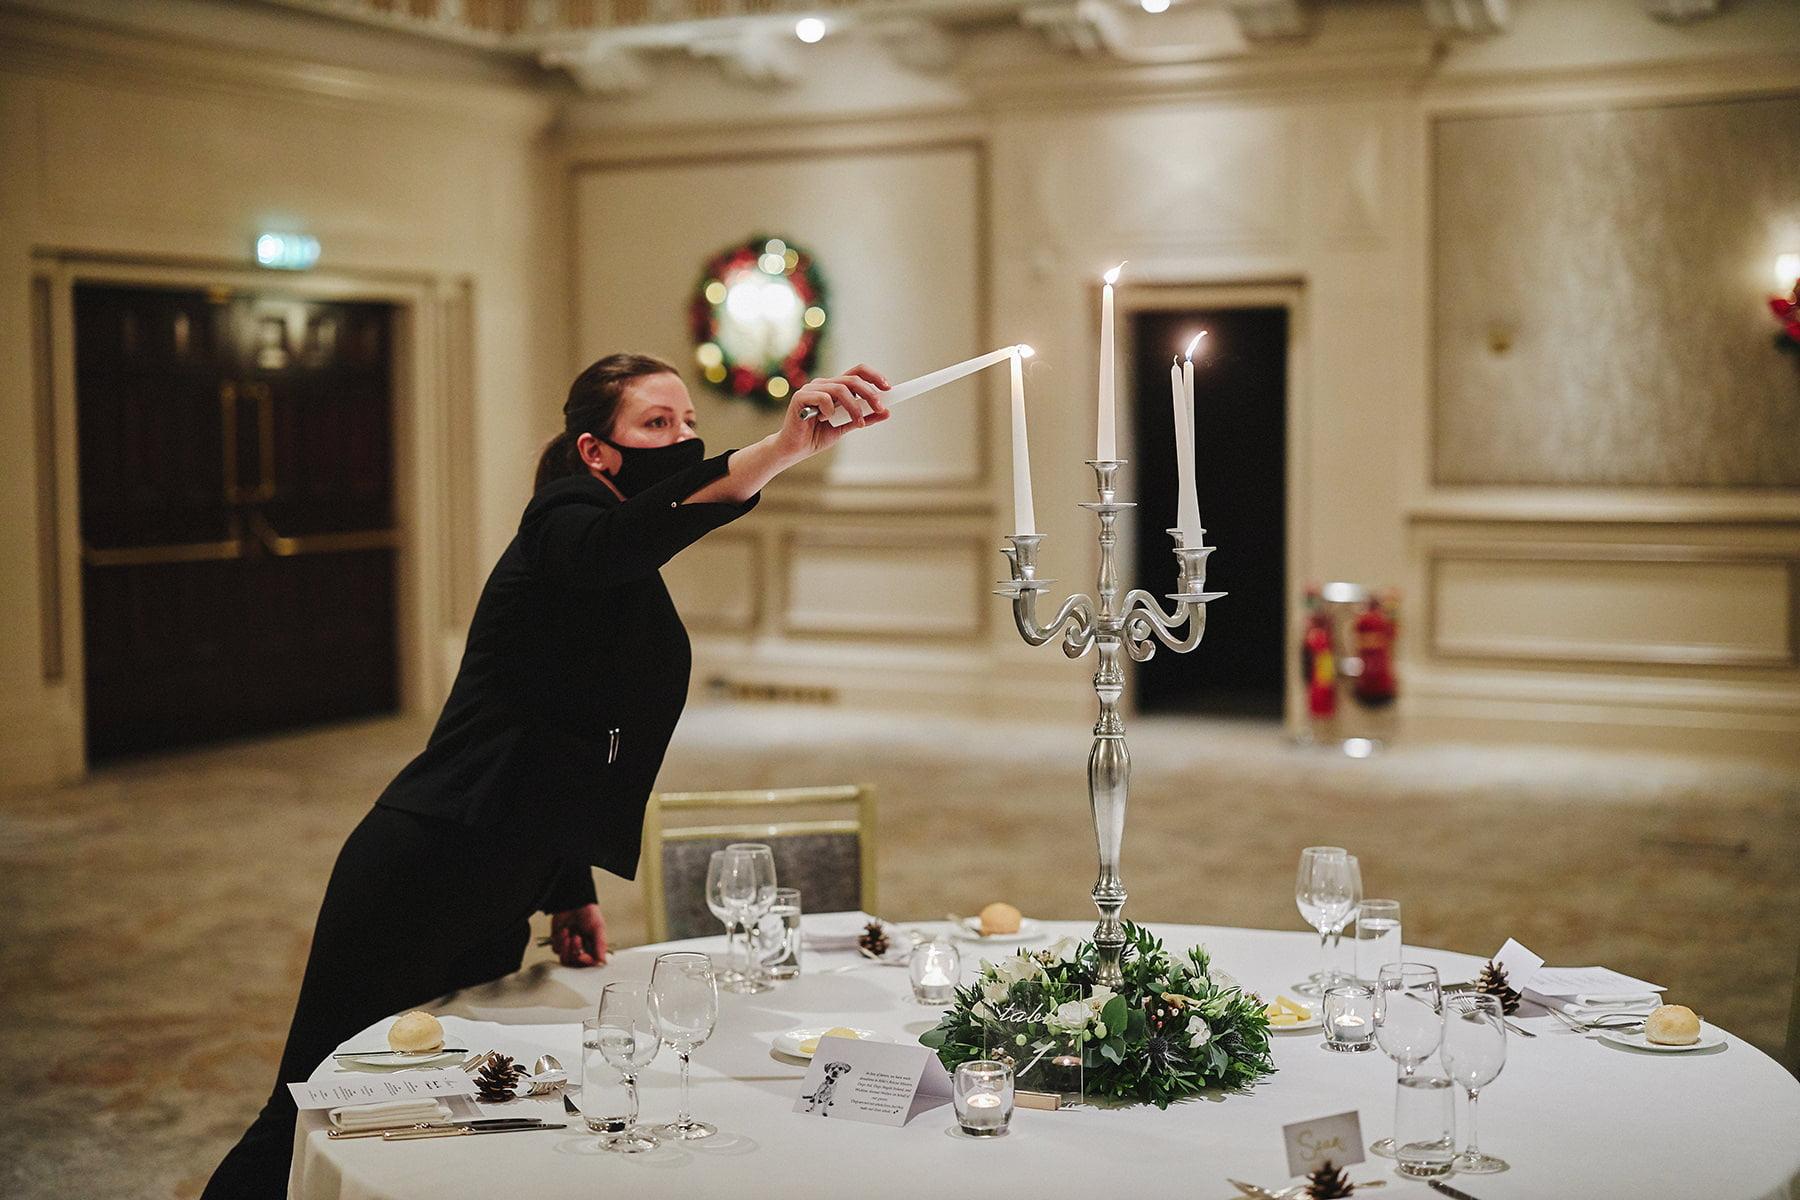 POWERSCOURT HOTEL RESORT INTIMATE WEDDING 89